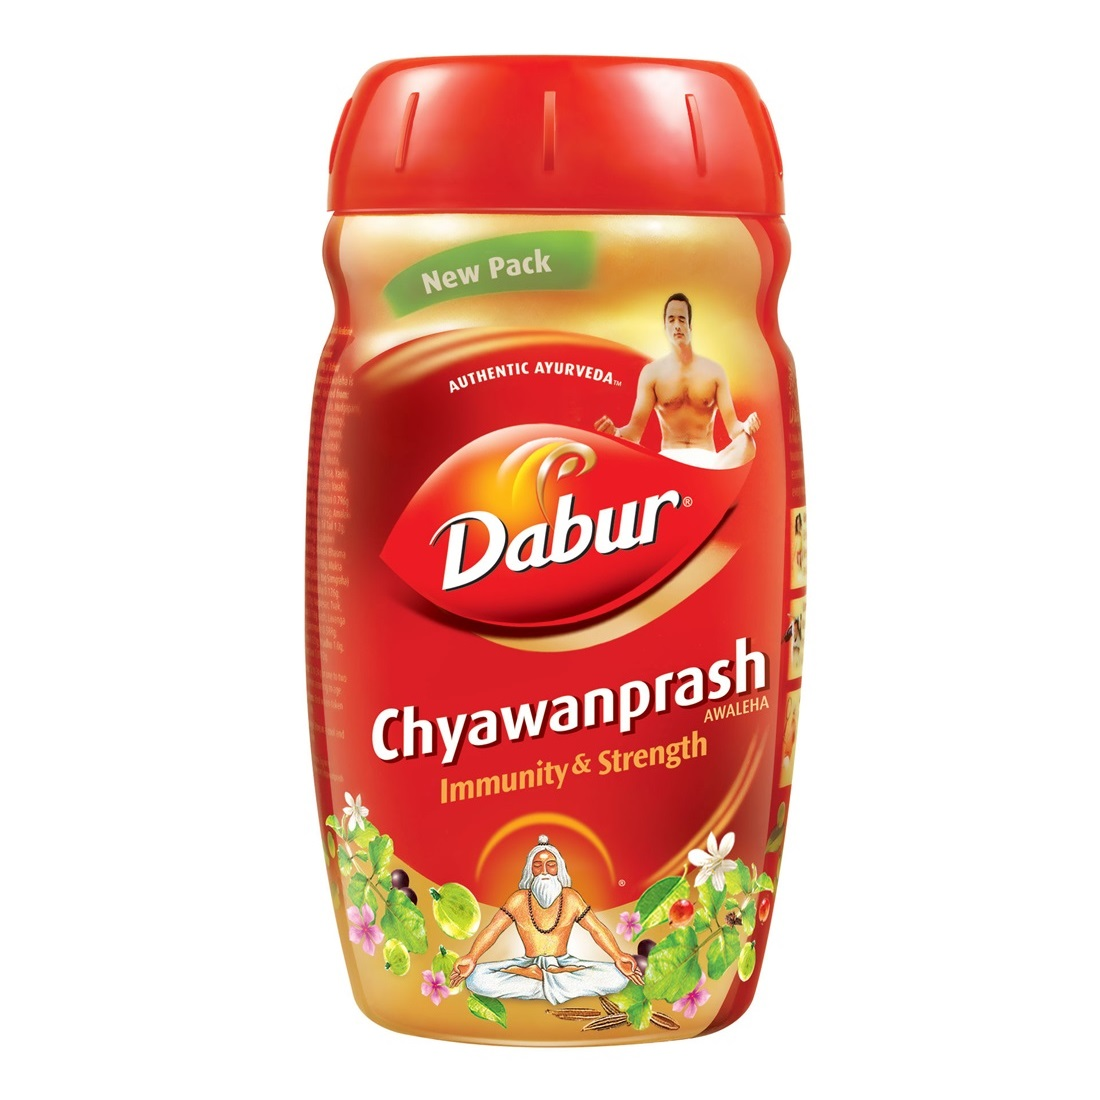 Чаванпраш специал 500гр chyawanprash special (500 gms)